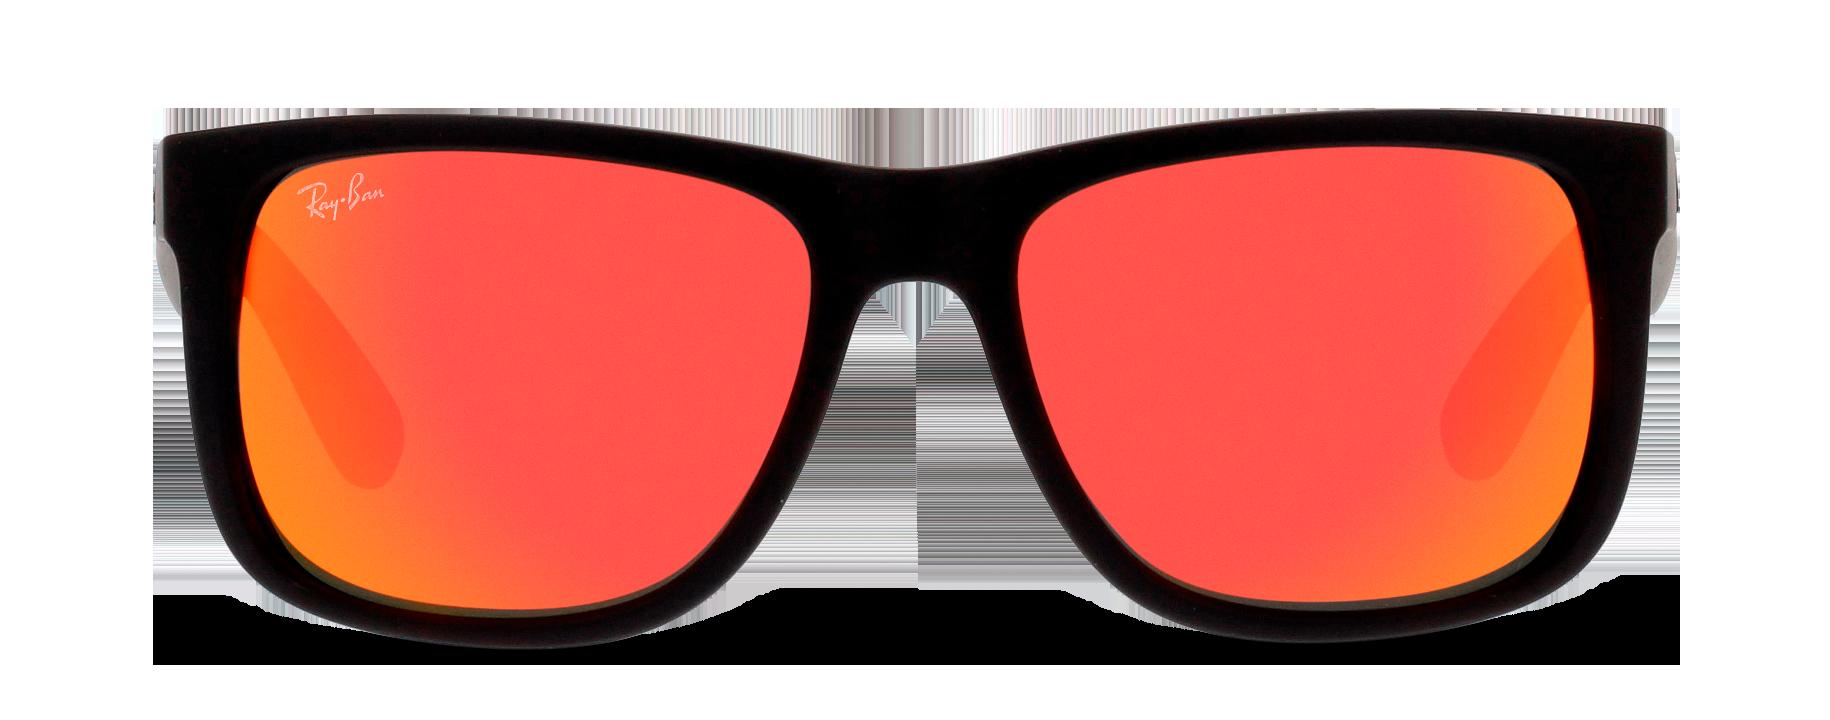 Front Ray-Ban Ray-Ban 0RB4165 622/6Q 54/16 Zwart/Oranje